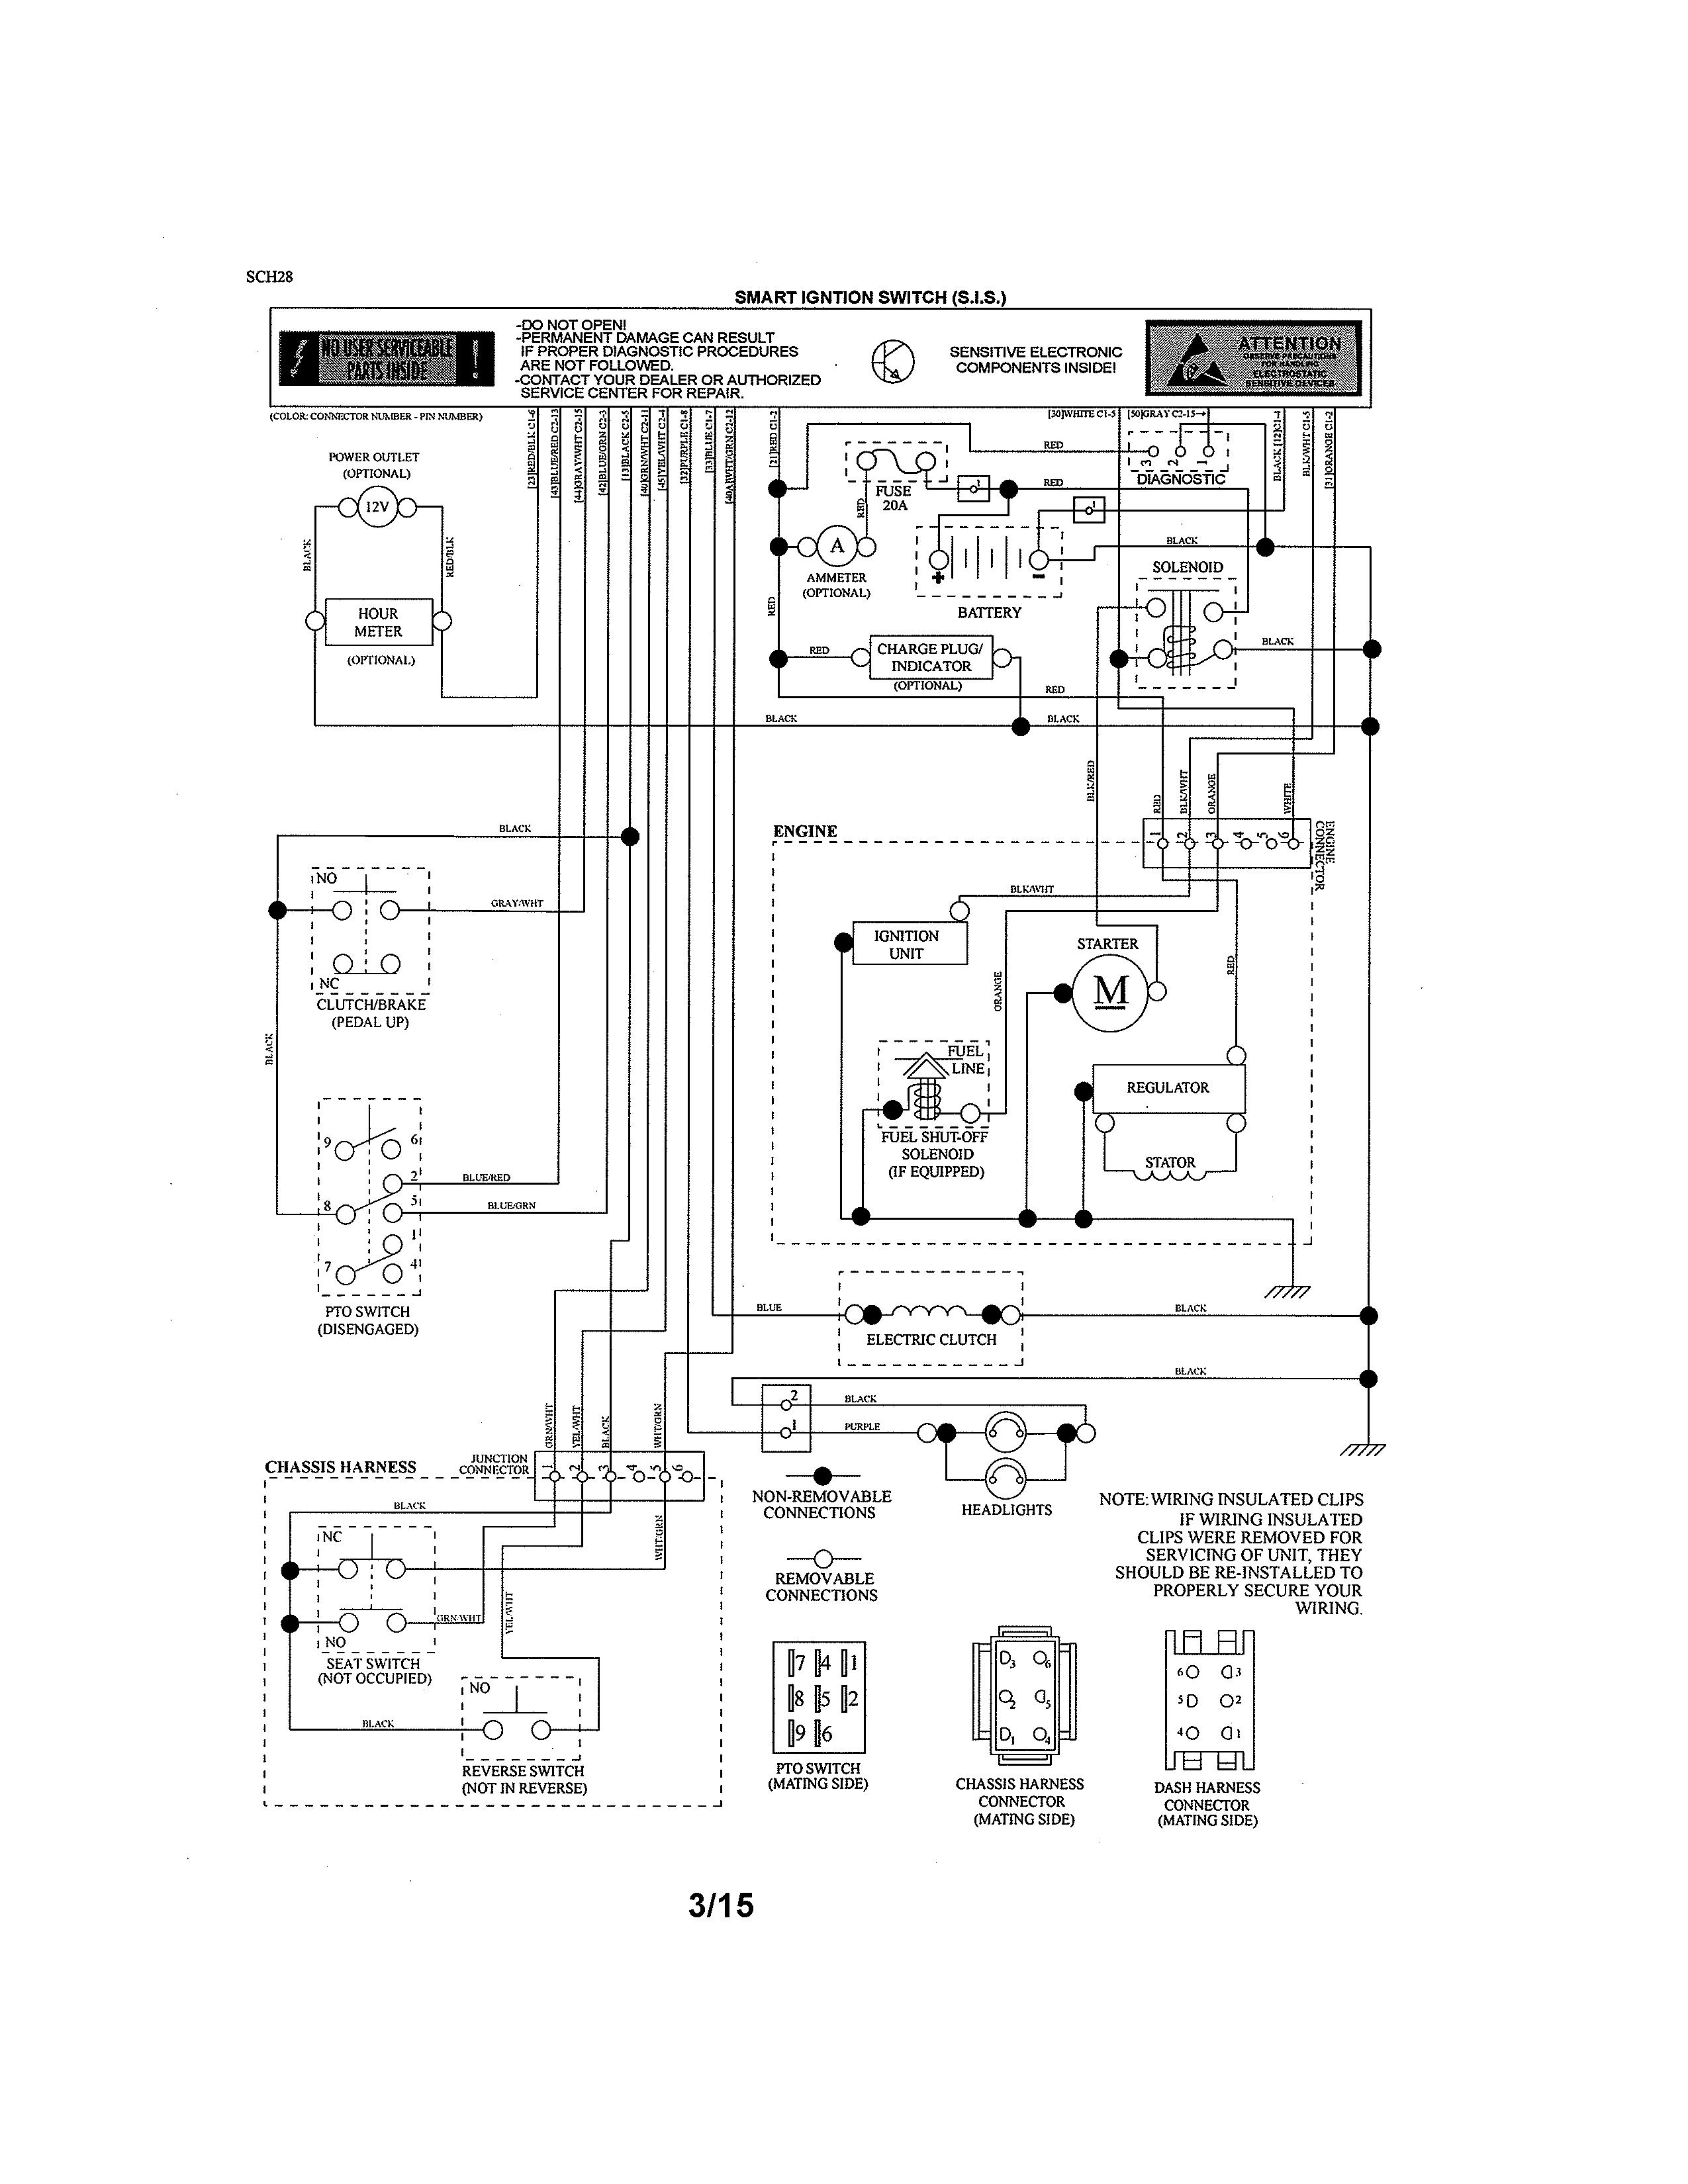 Craftsman Garden Tractor 954140005 Wiring Diagram John Deere 1530 Wiring Diagram For Wiring Diagram Schematics